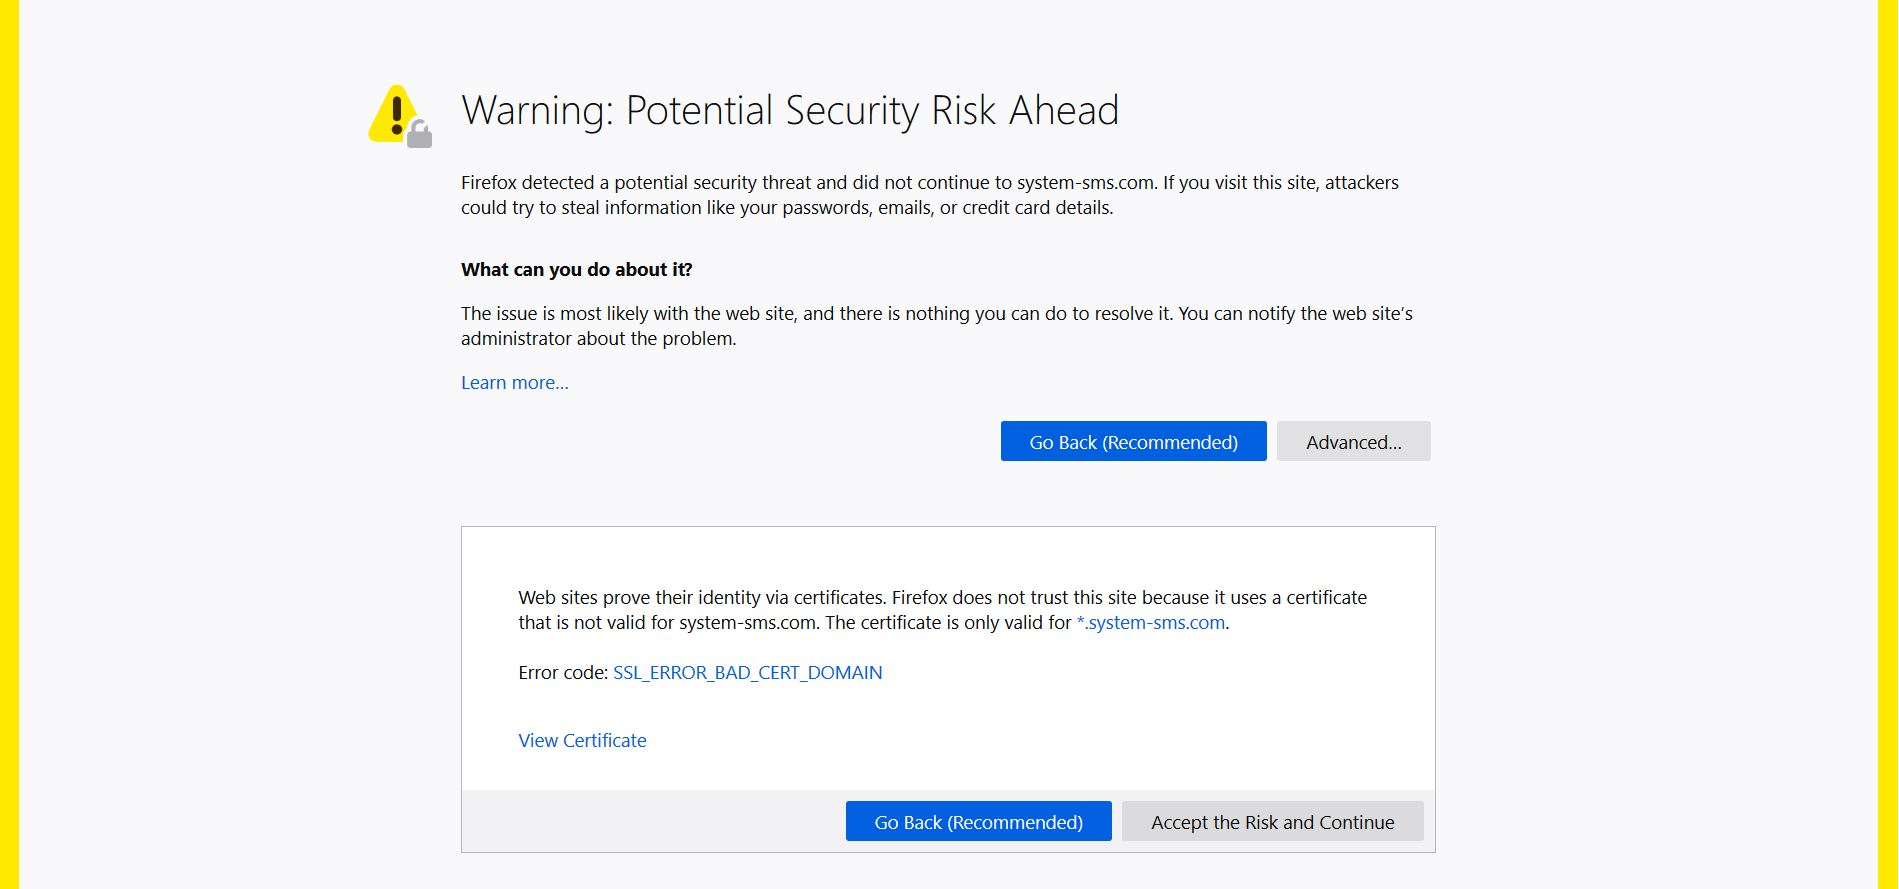 firefox warning notification System-sms.com hides potential security risk sensorstechforum